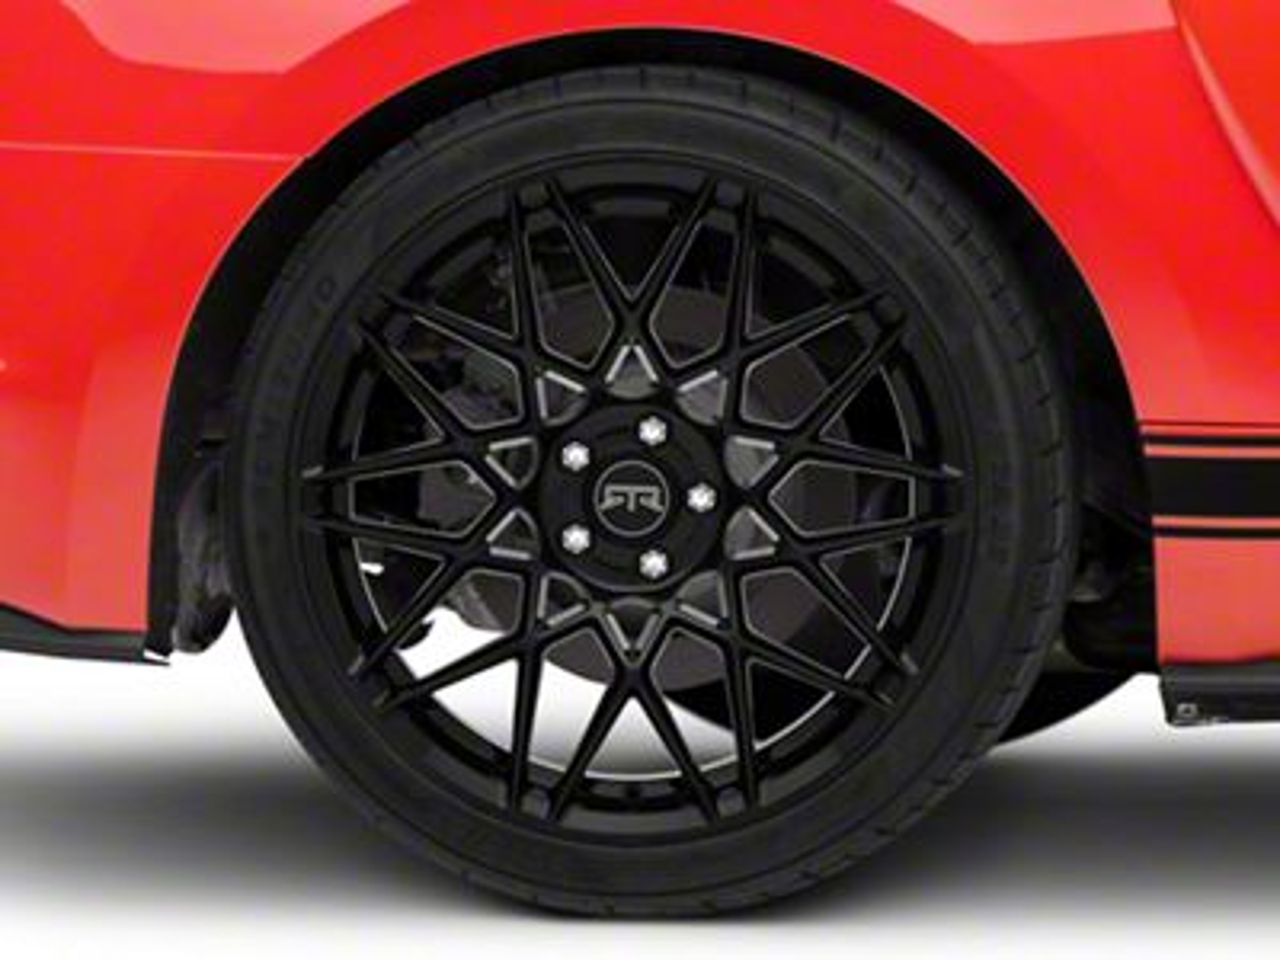 RTR Tech Mesh Black Wheel - 20x10.5 - Rear Only (15-19 All)